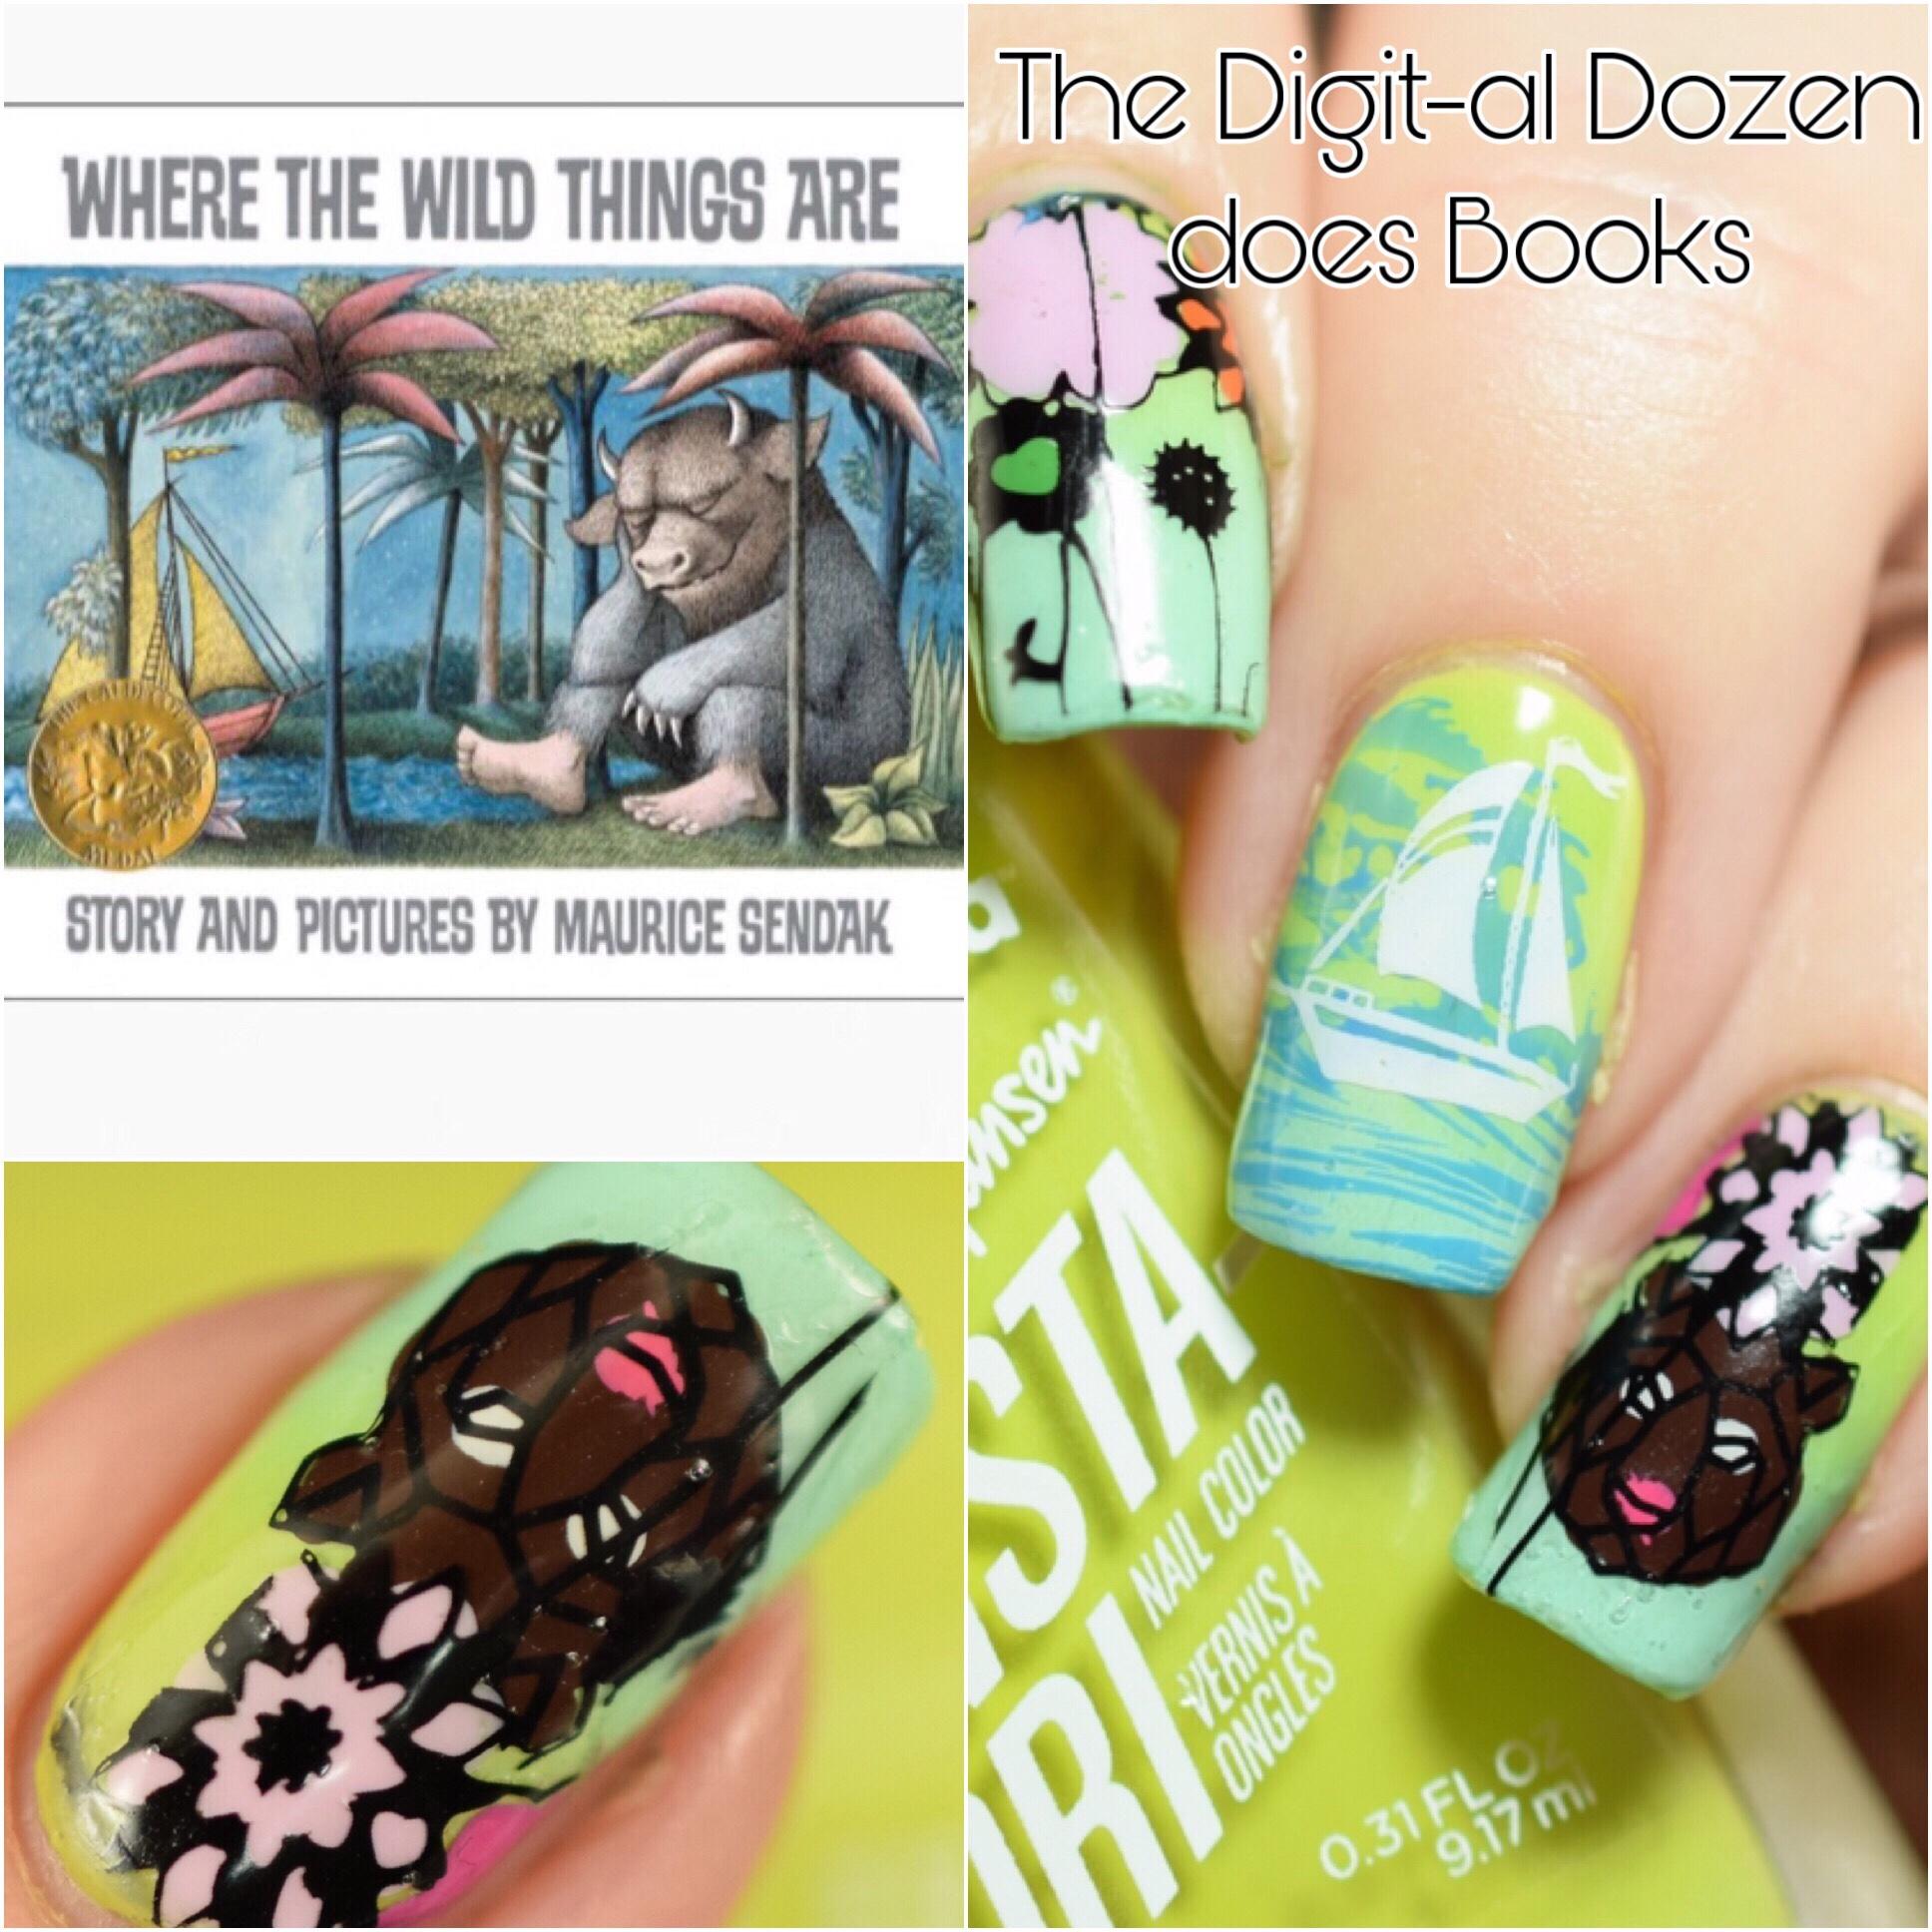 PolishandPaws Digital Dozen Where the Wild Things Are book mani